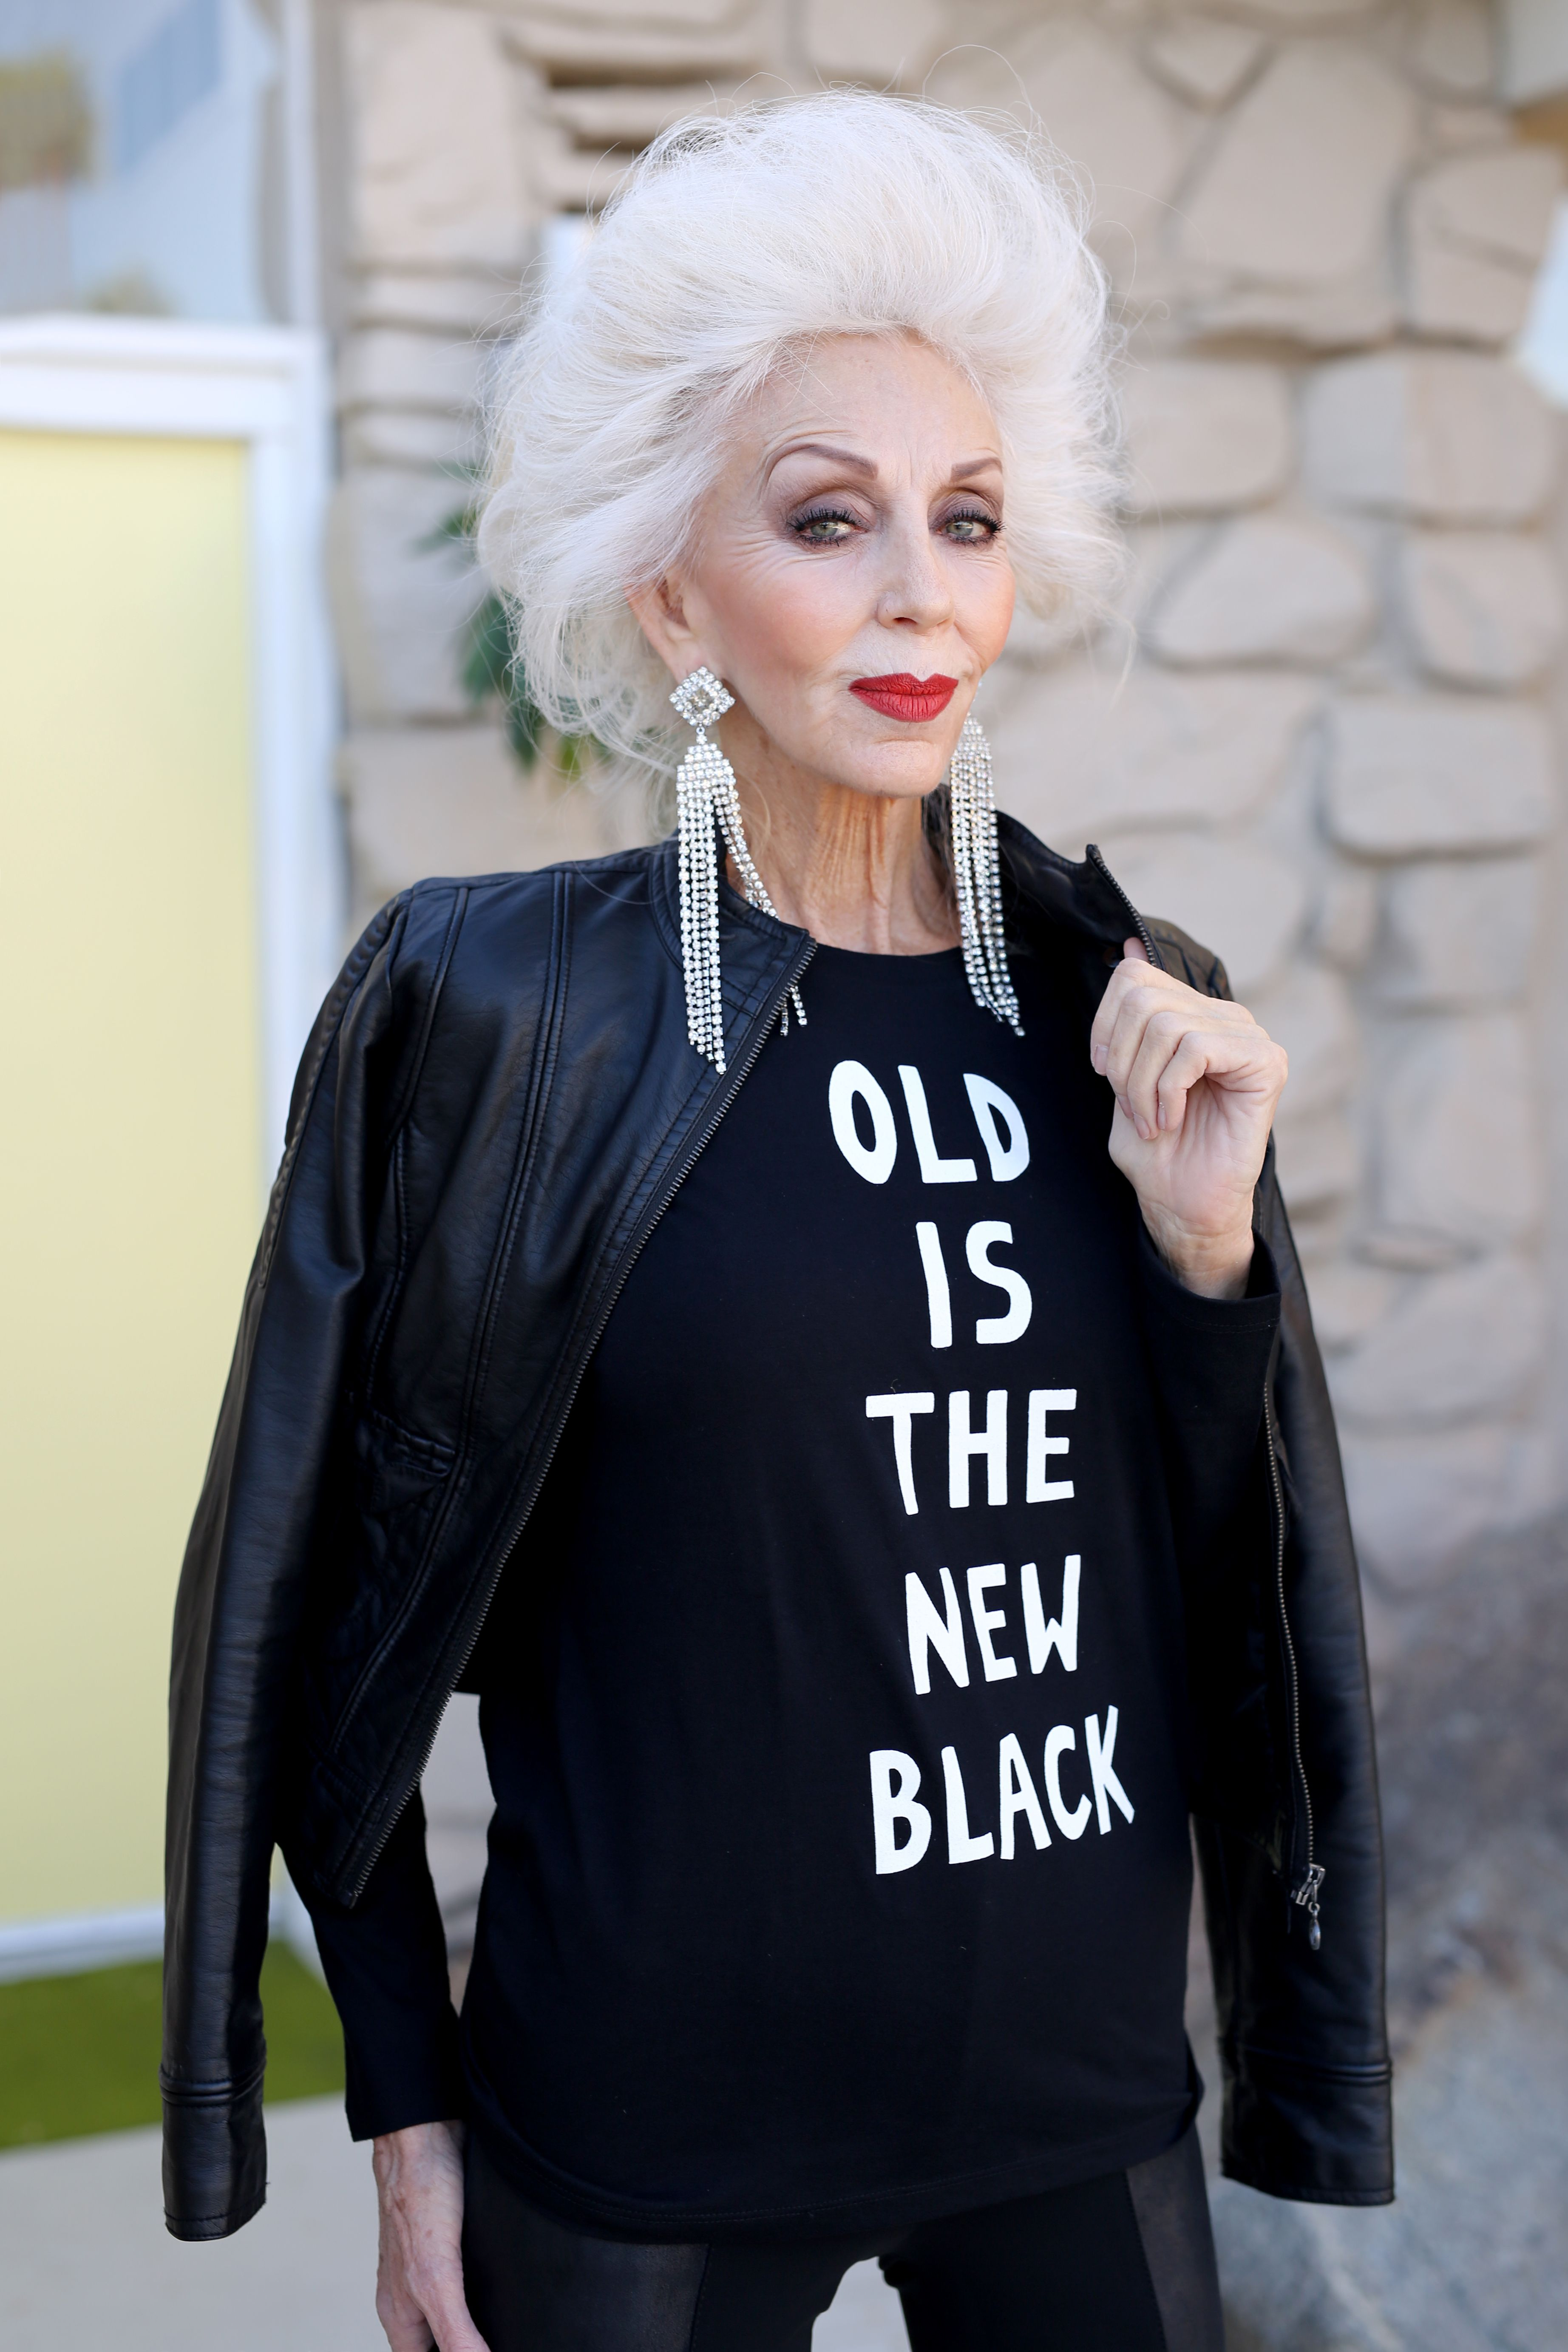 Old is the new black ElderGoth GeriPunk Advanced style